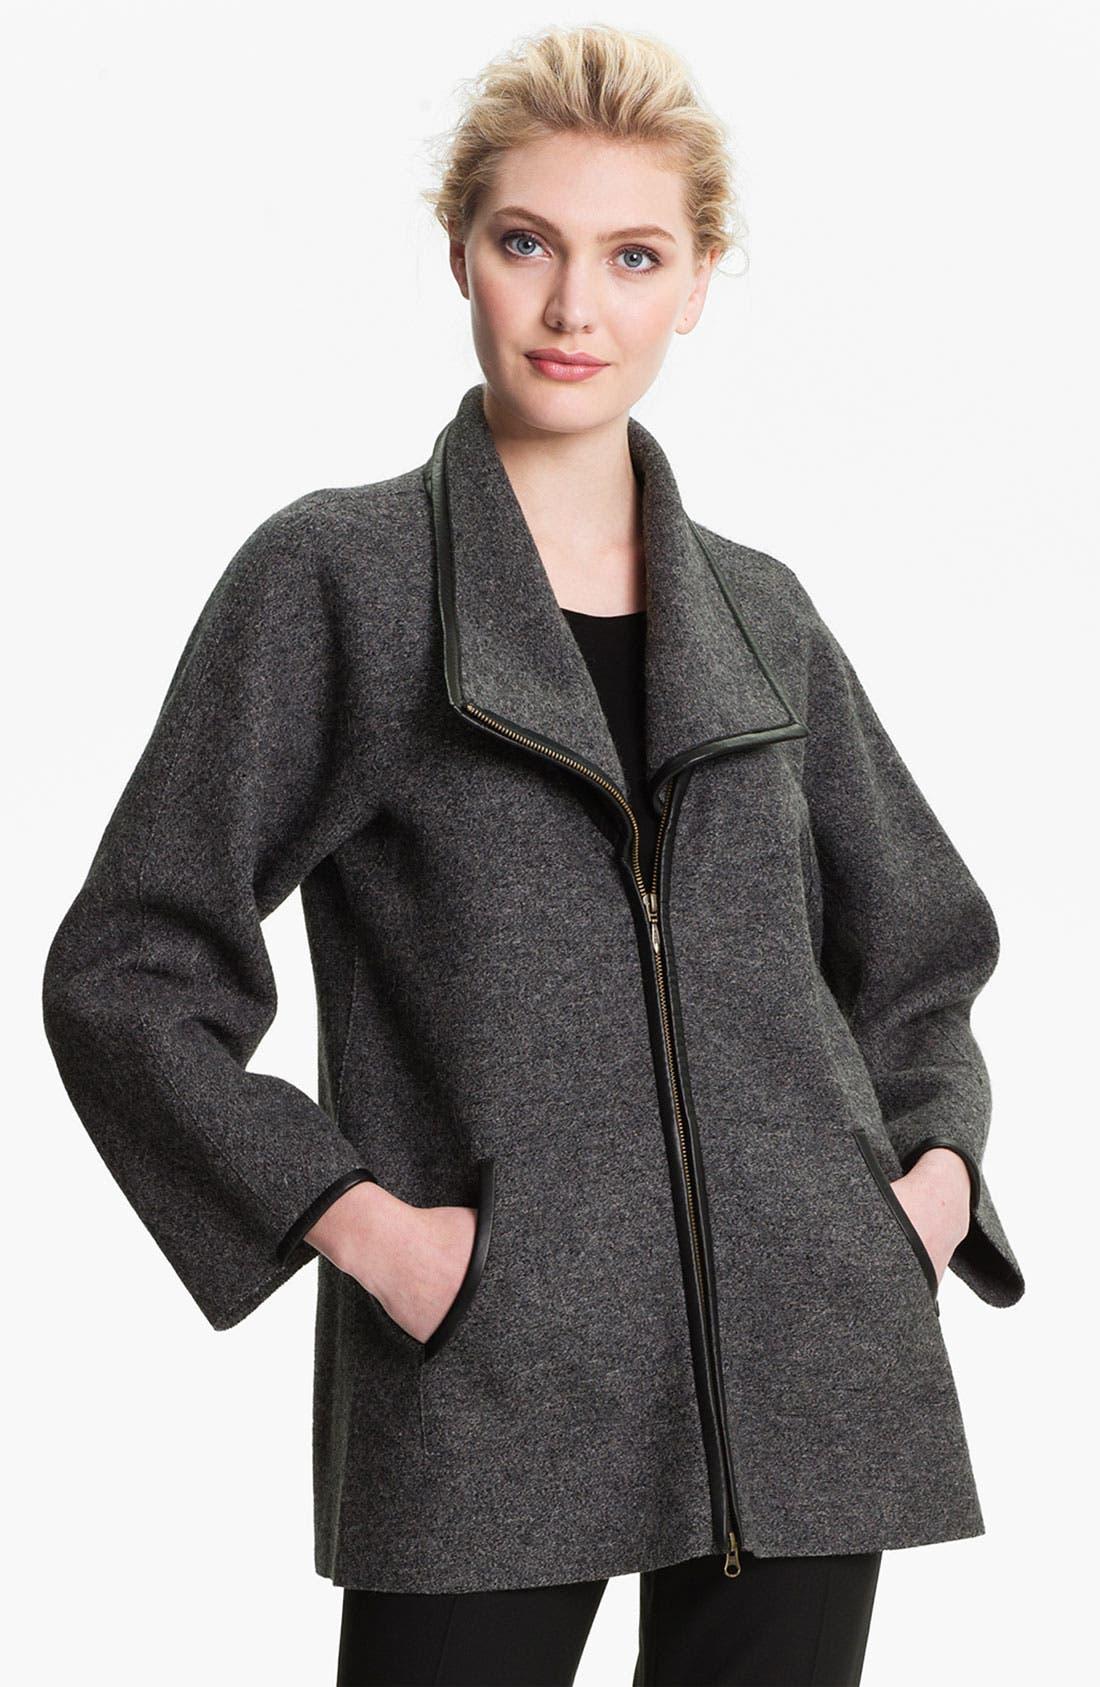 Alternate Image 1 Selected - Beyond Threads 'Corina' Alpaca Blend Jacket